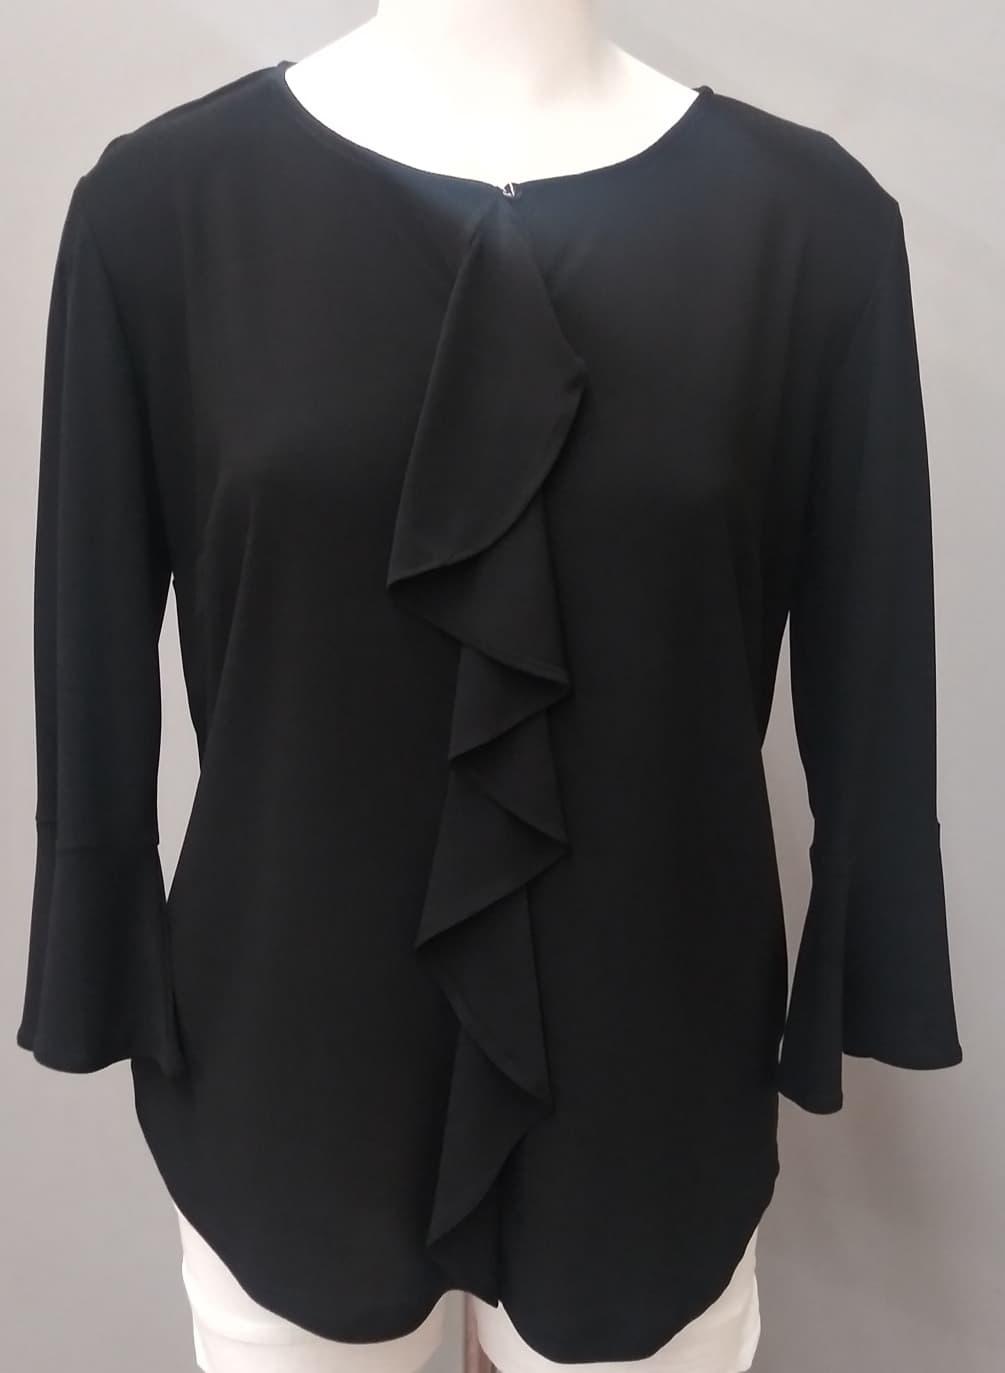 Black 3/4 Sleeve Jolianne Top